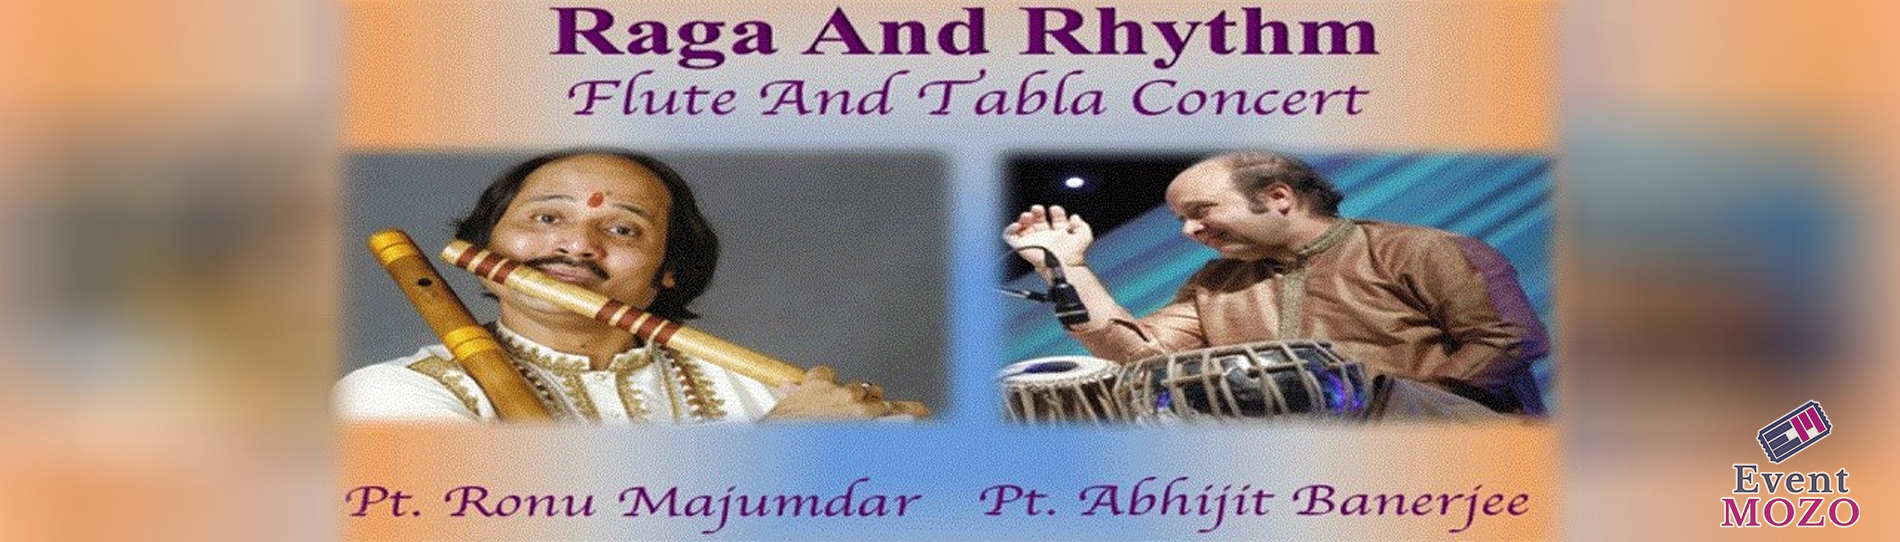 EventMozo Raga And Rhythm - Flute and Tabla Concert